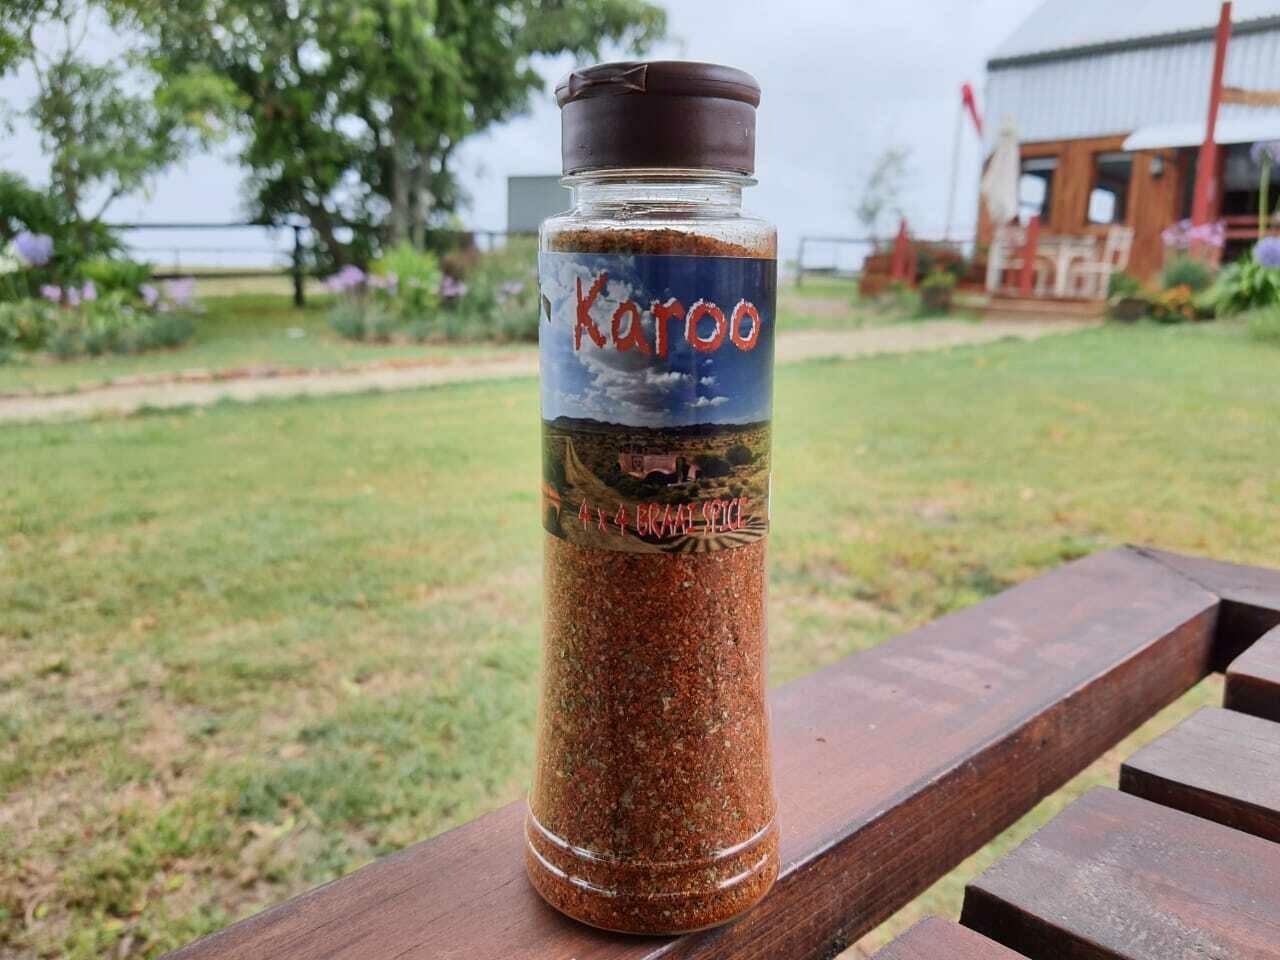 4 x 4 Karoo Braai Spice  - 325ml